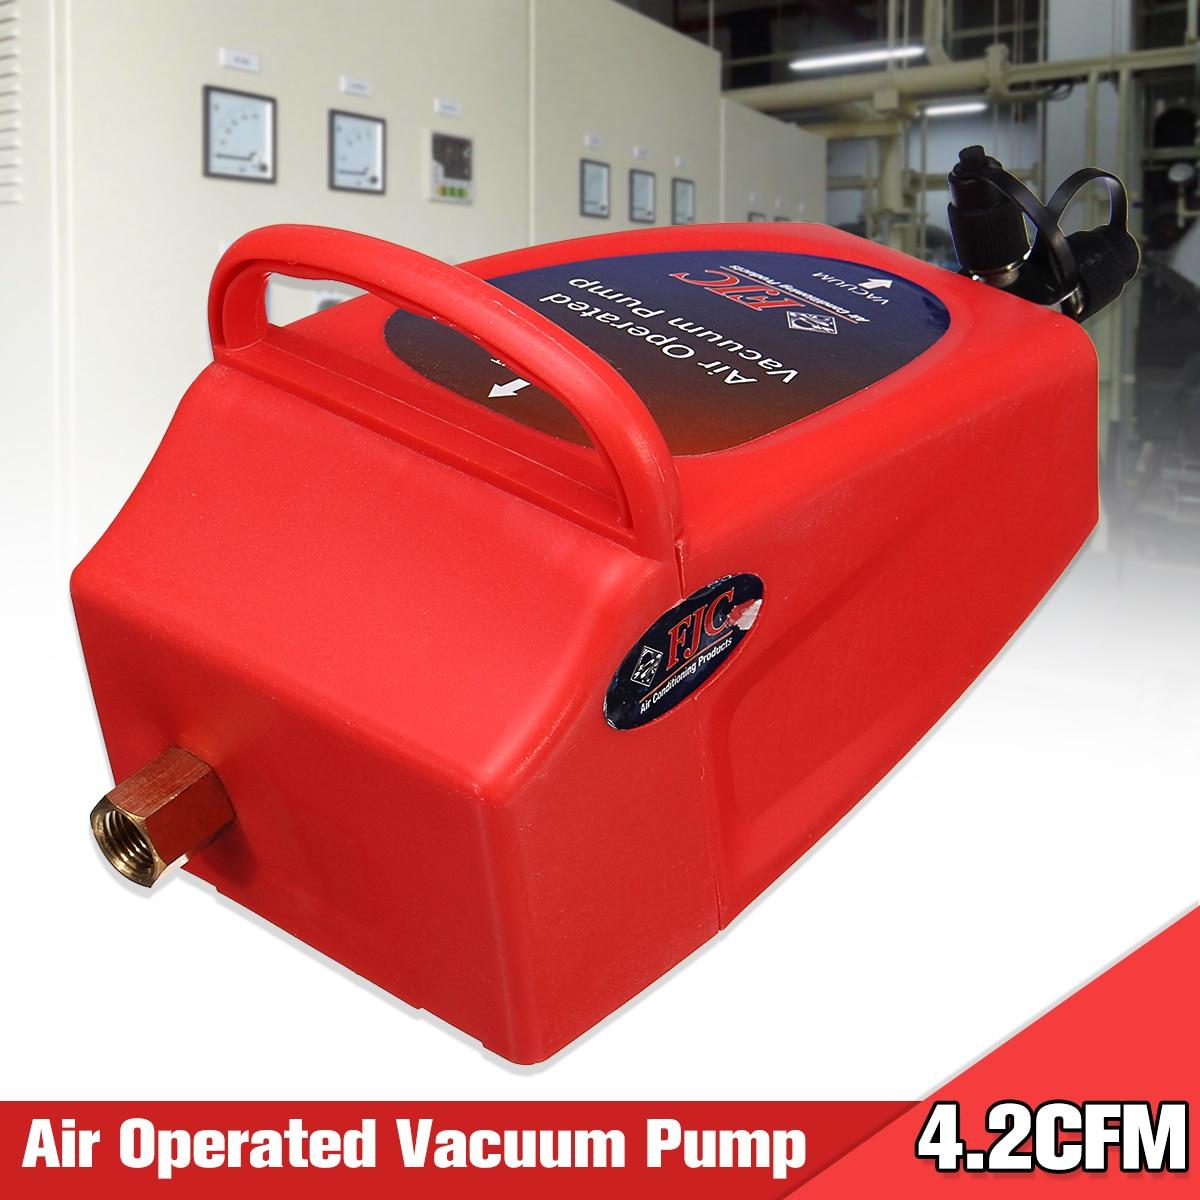 4.2CFM Air Operated Vacuum Pump A/C Air Conditioning System Tool Auto 1/2 ACME (R134a) & R12 Connector 80~150PSI Air Pressure 155 80 r12